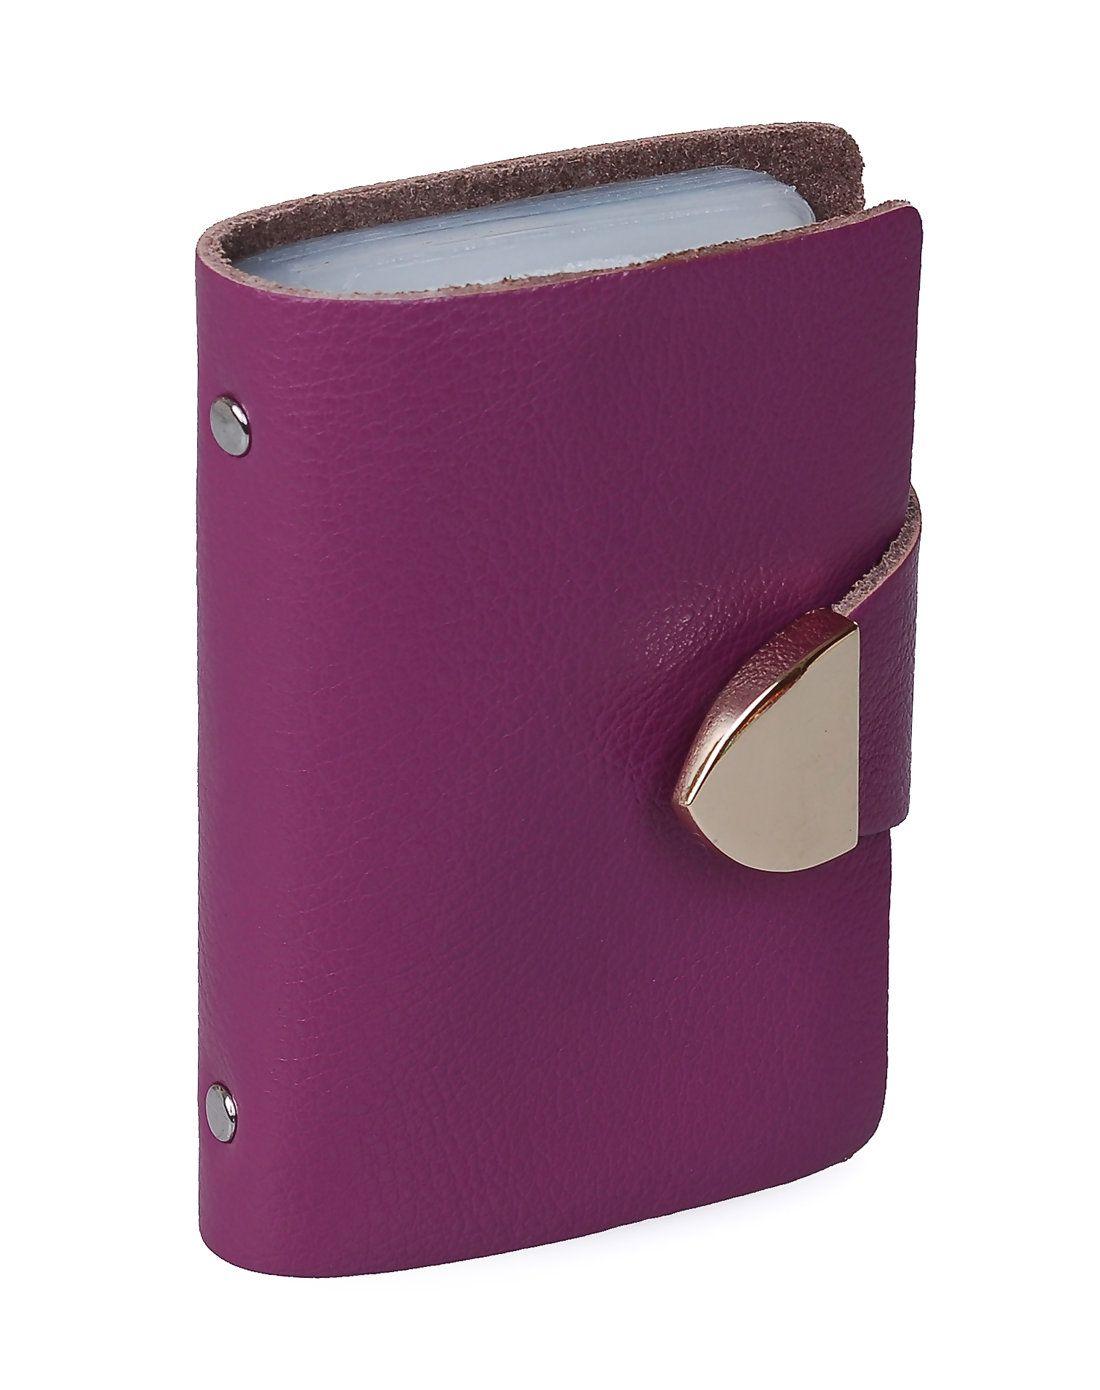 AdoreWe #VIPme Coin & Card Cases - Melovo Fashion Genuine Leather ...